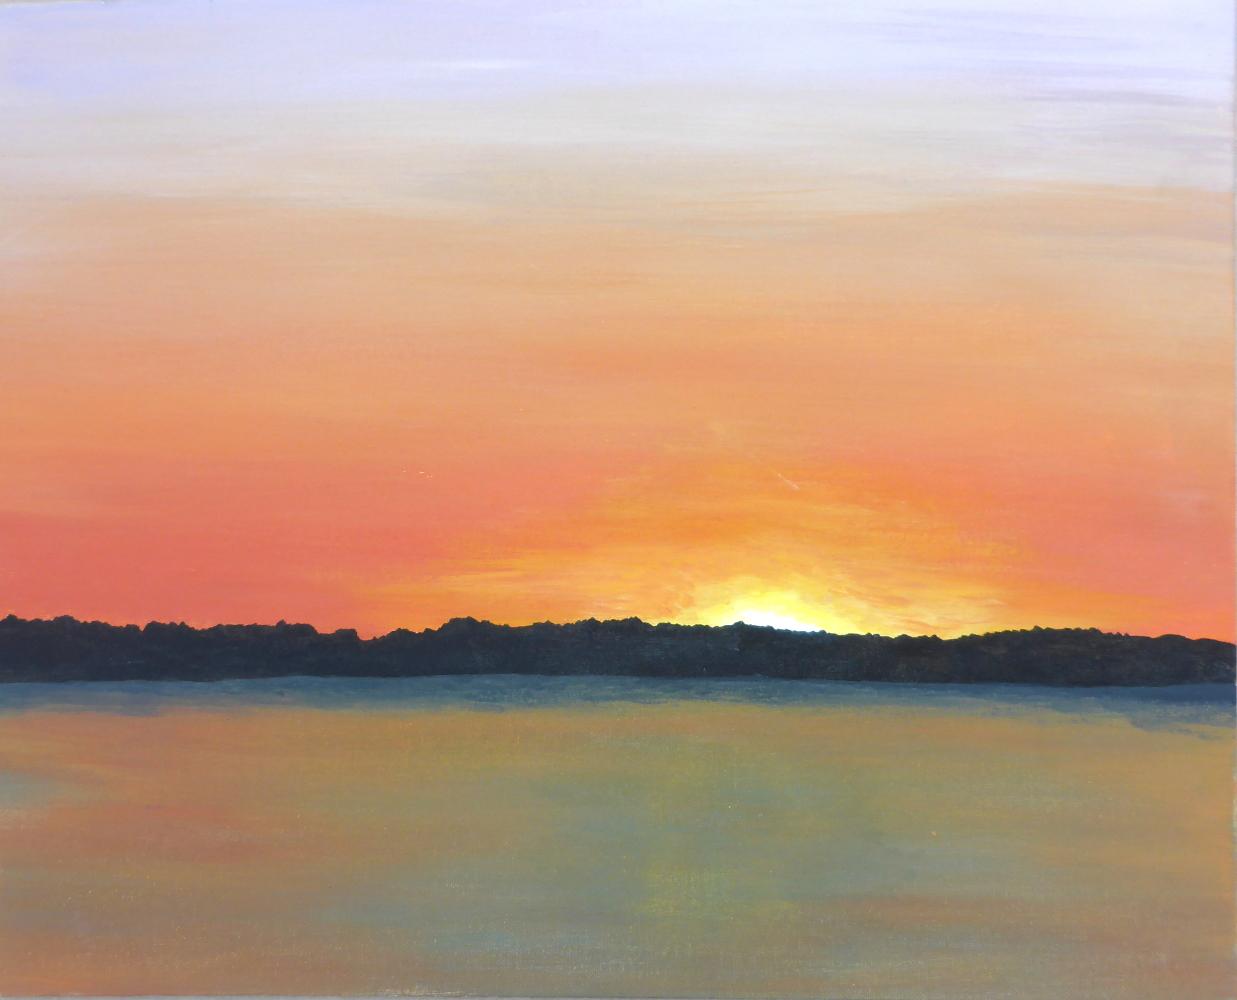 """Sonnenuntergang"", 2018, Acryl auf Pappe, 50 x 40 cm"